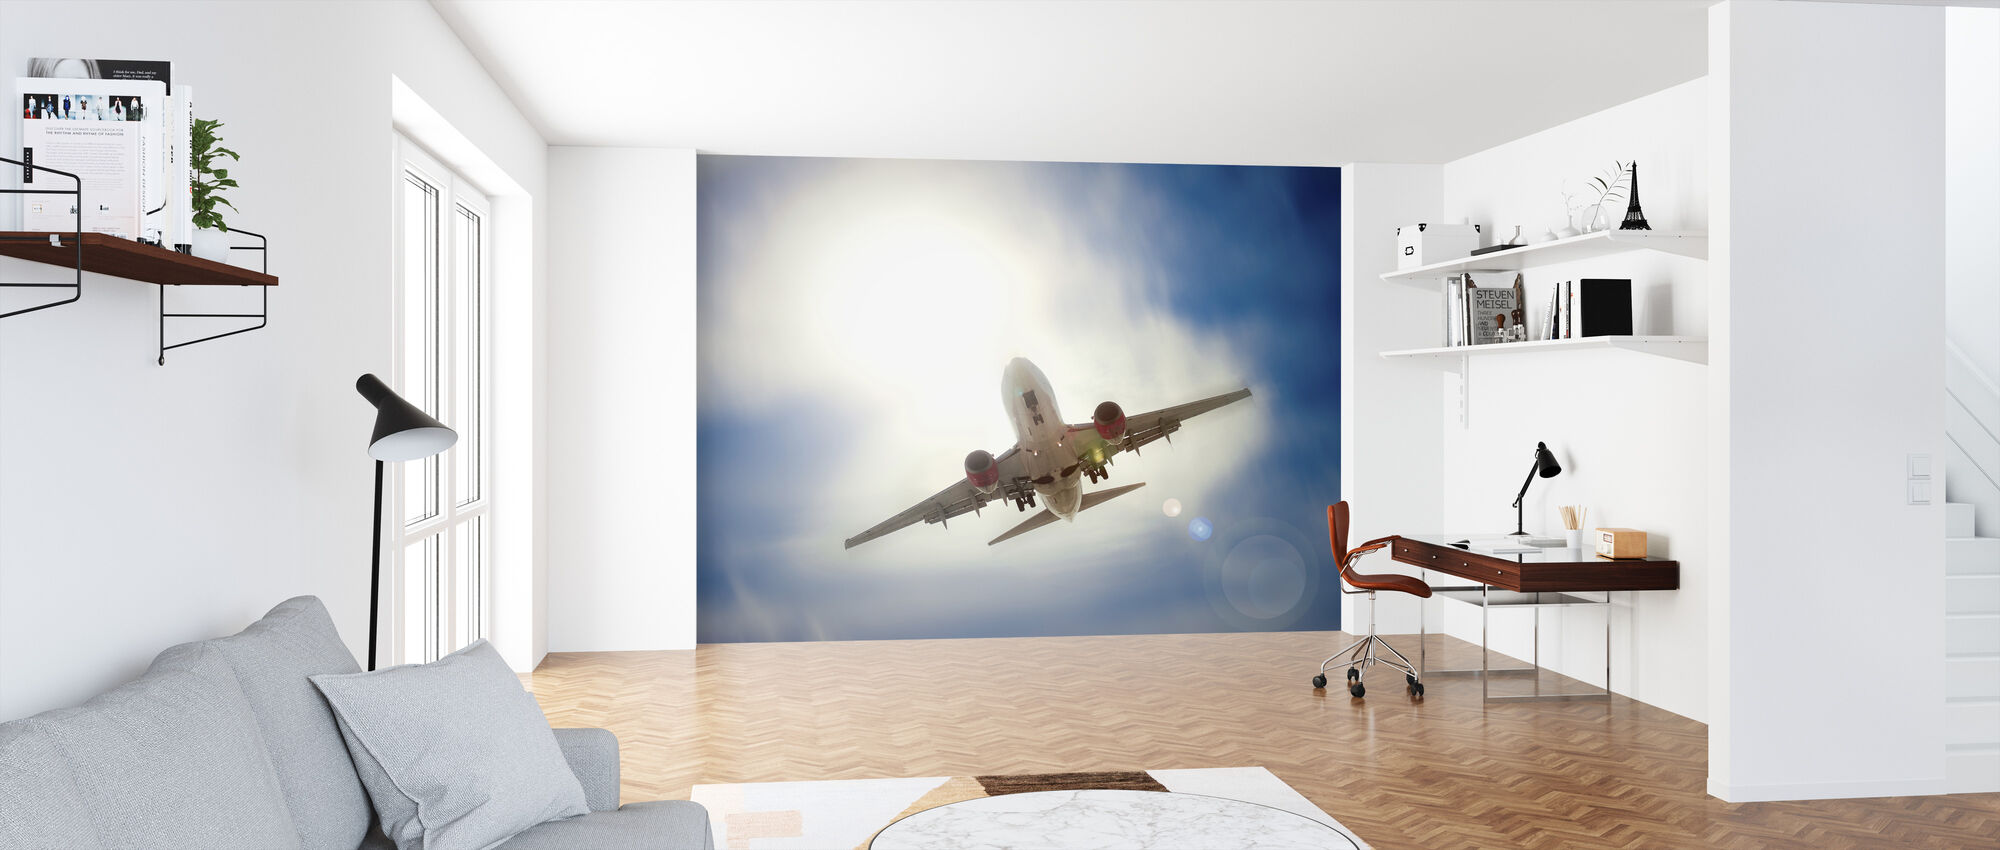 Airplane in Cloud - Wallpaper - Office